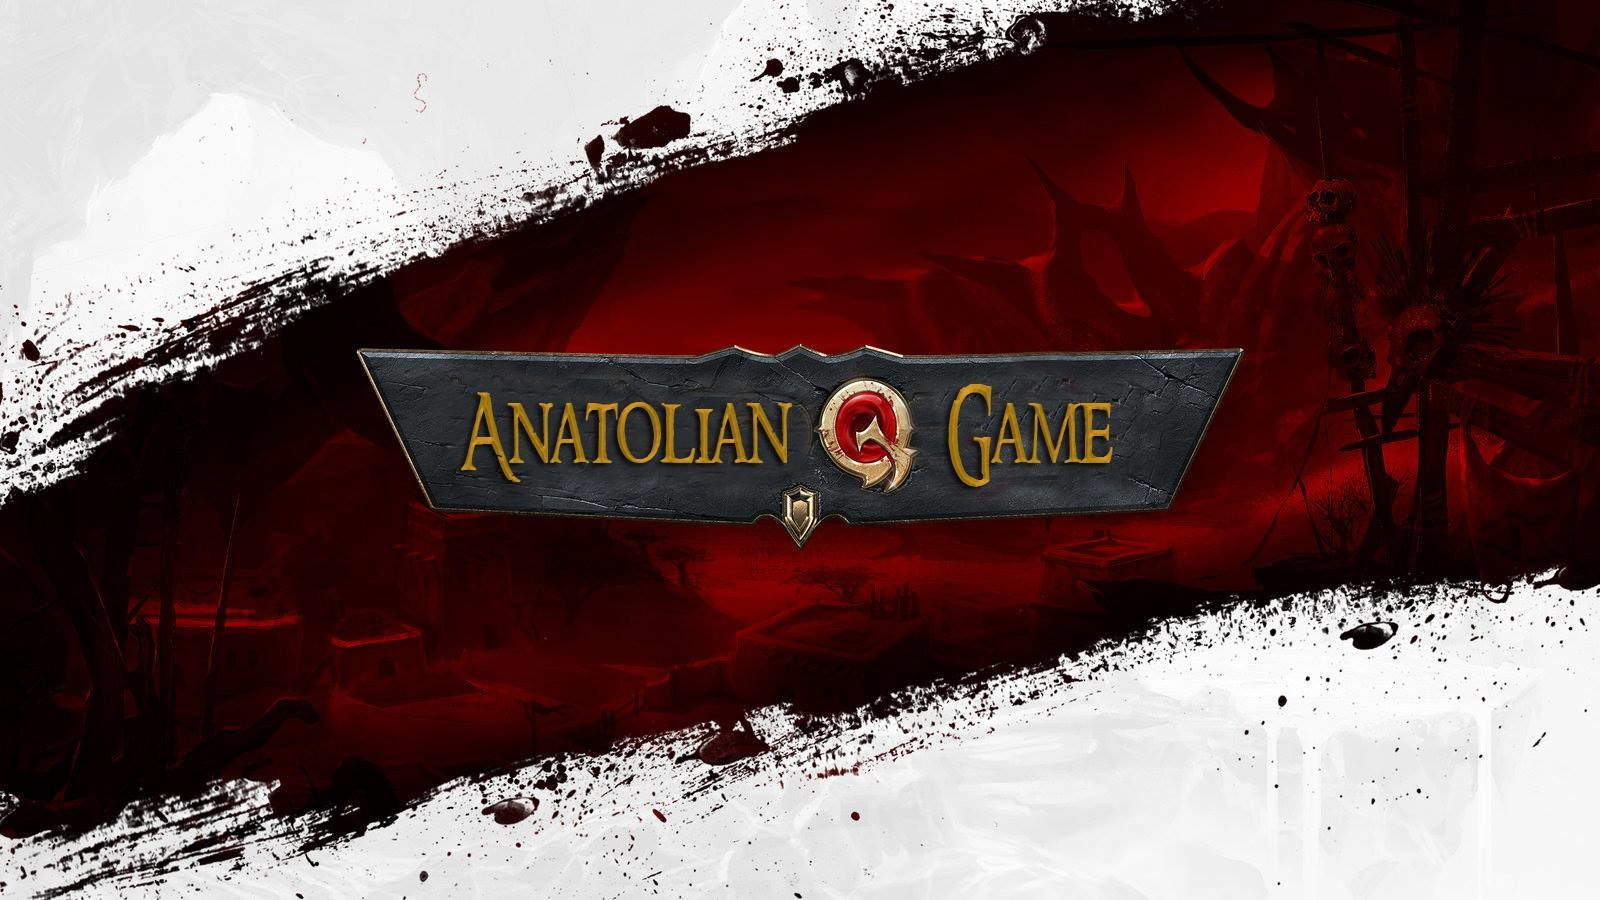 Anatolian Online ♦ v2024 Light Farm ♦ Ardream-Colony Zone ♦ A��l��a �zel M�kemmel Hediyeler 17 Haziran'da A��l�yor